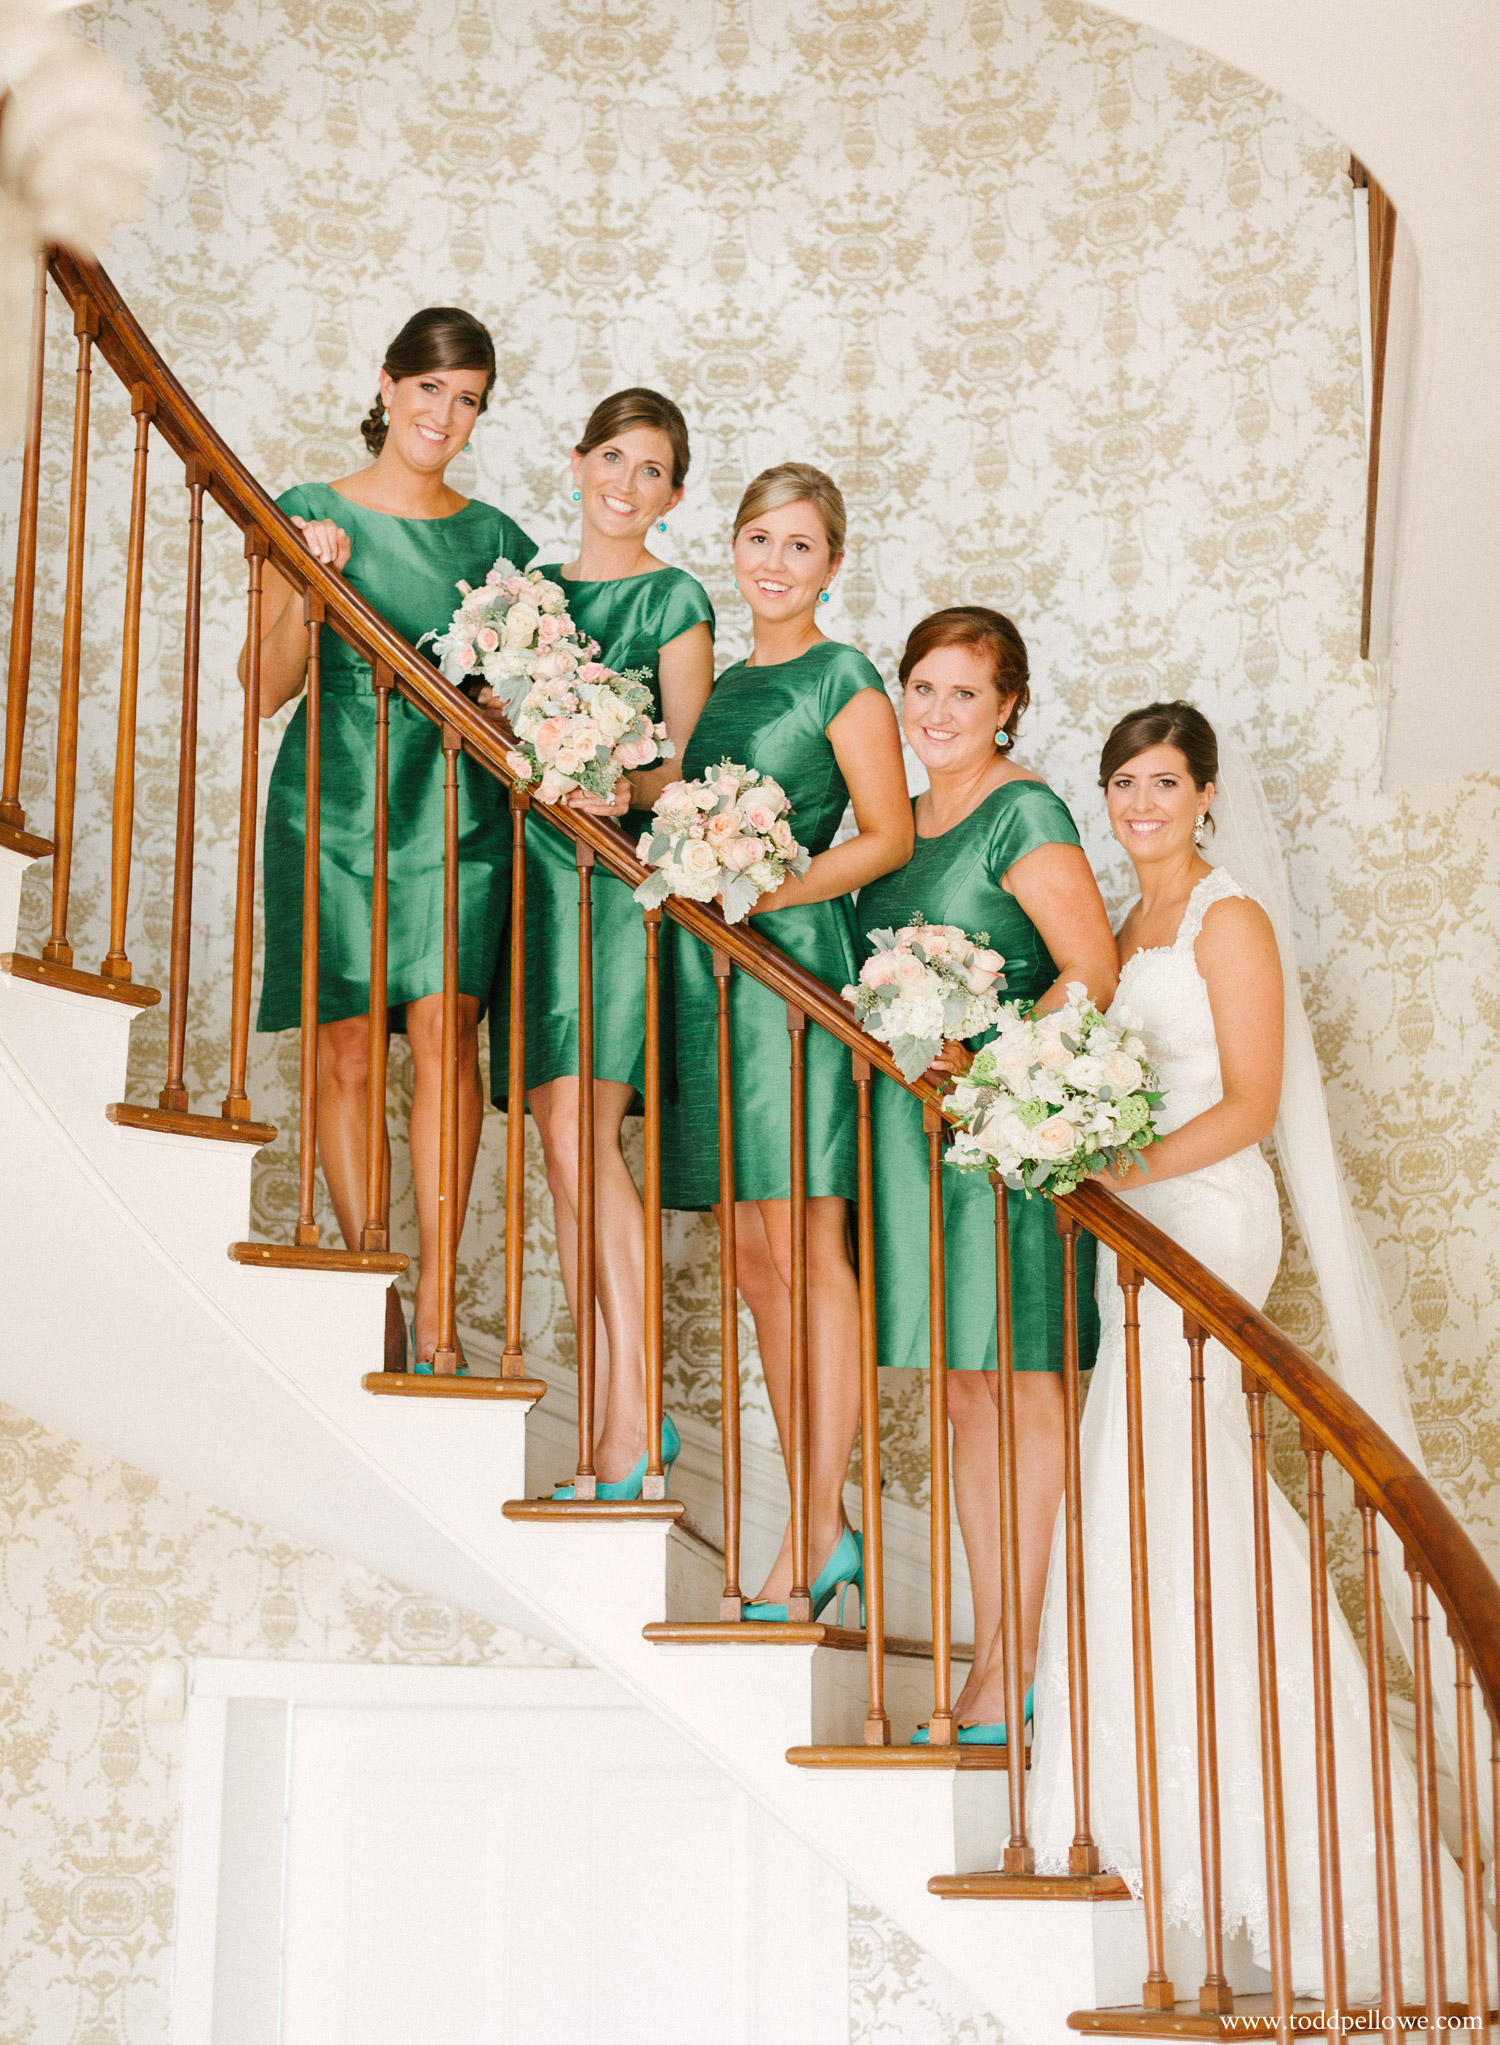 008-bardstown-kentucky-wedding-087.jpg